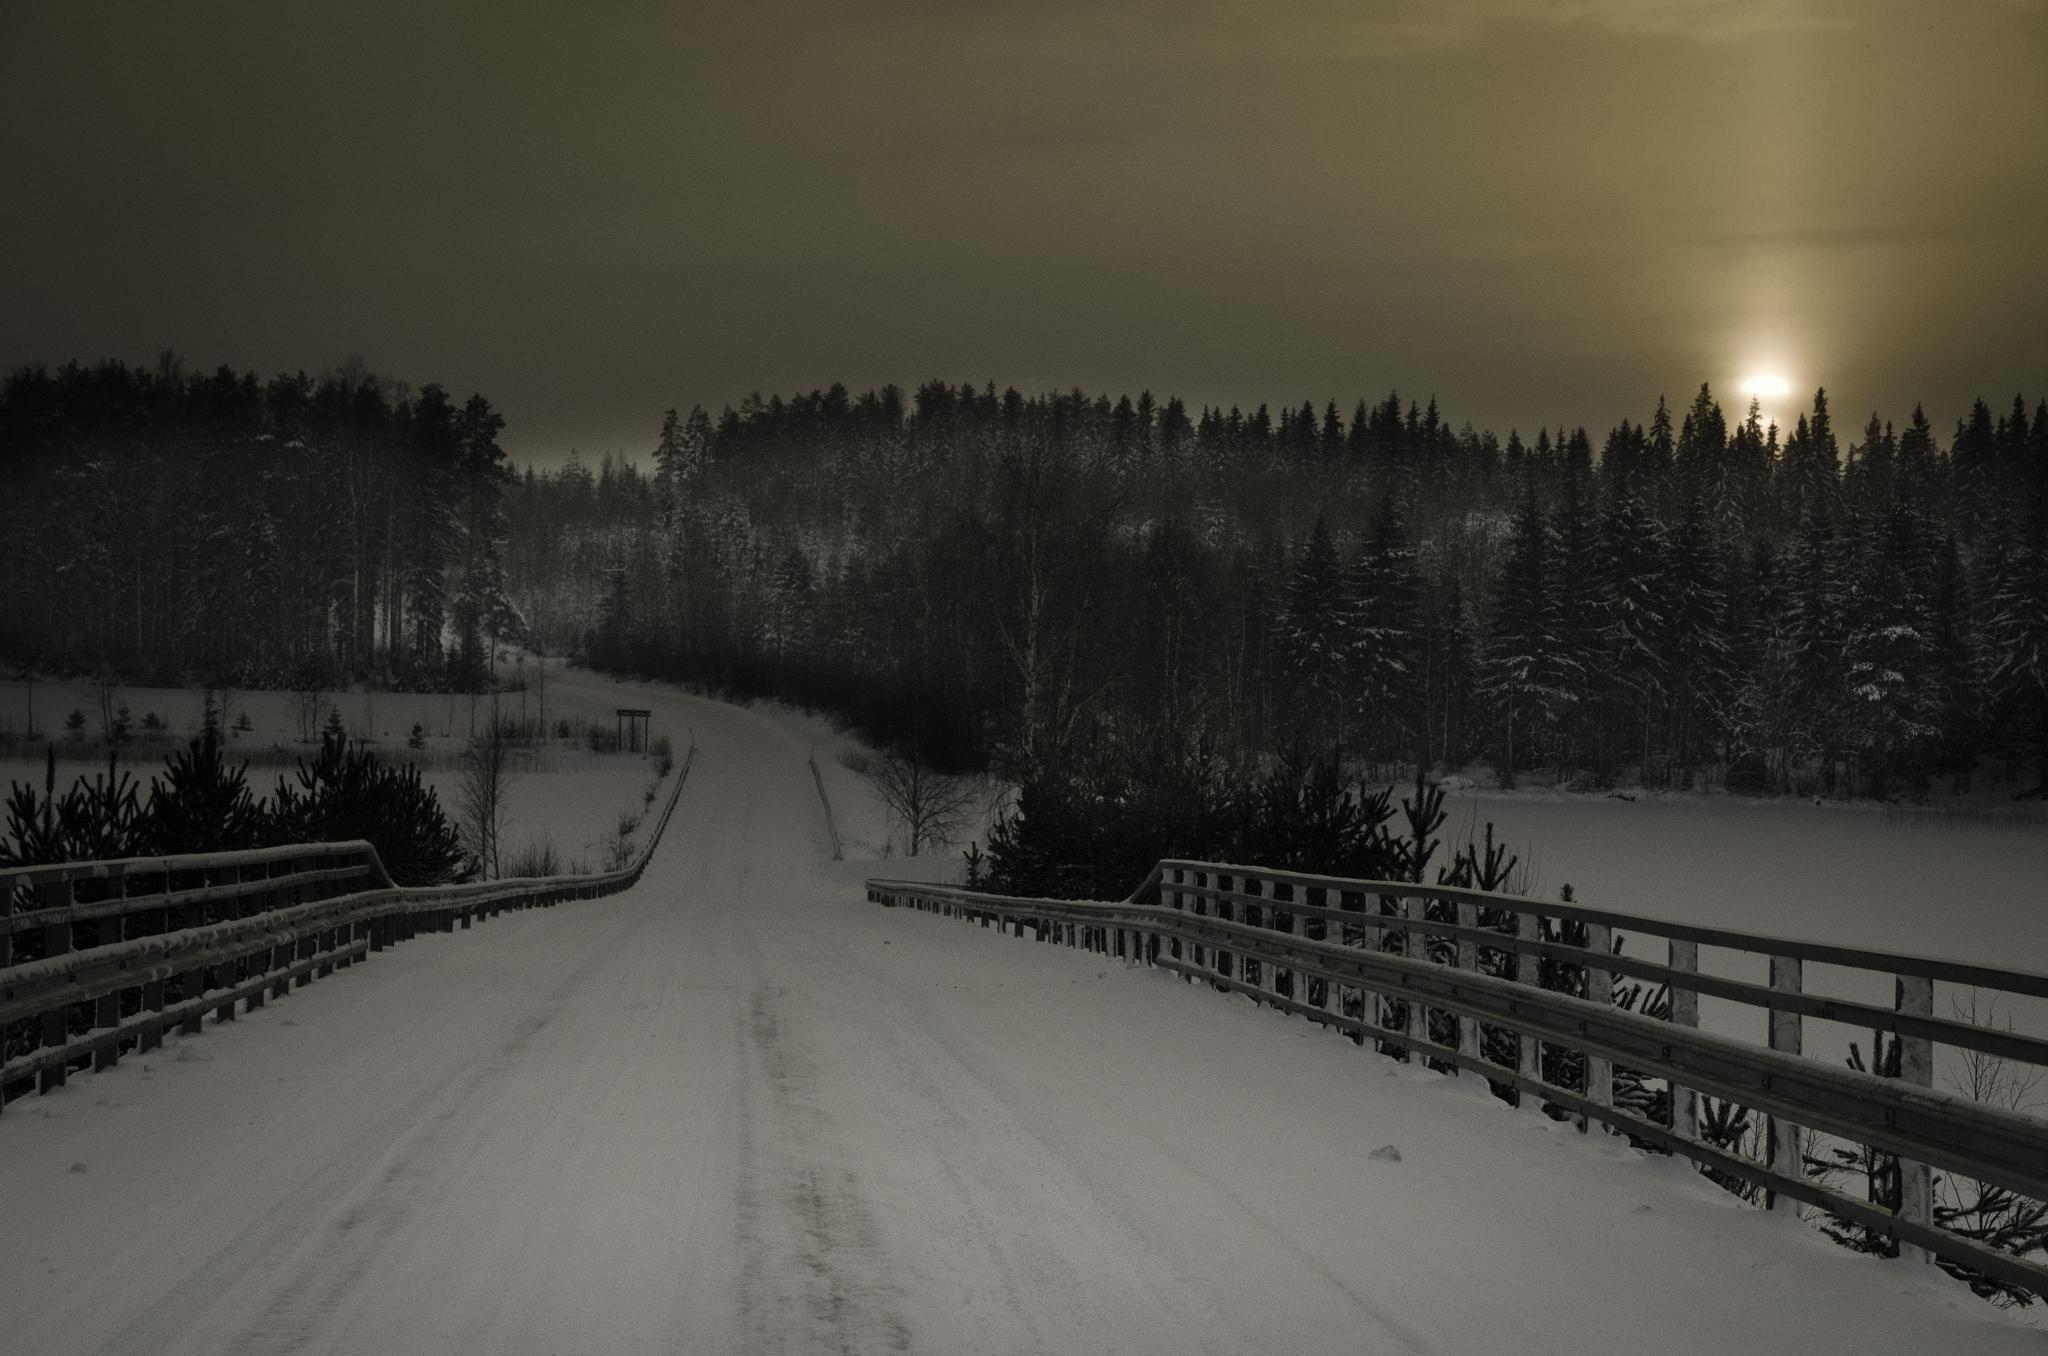 The Moment when Crossing a Bridge by pekka ilari t